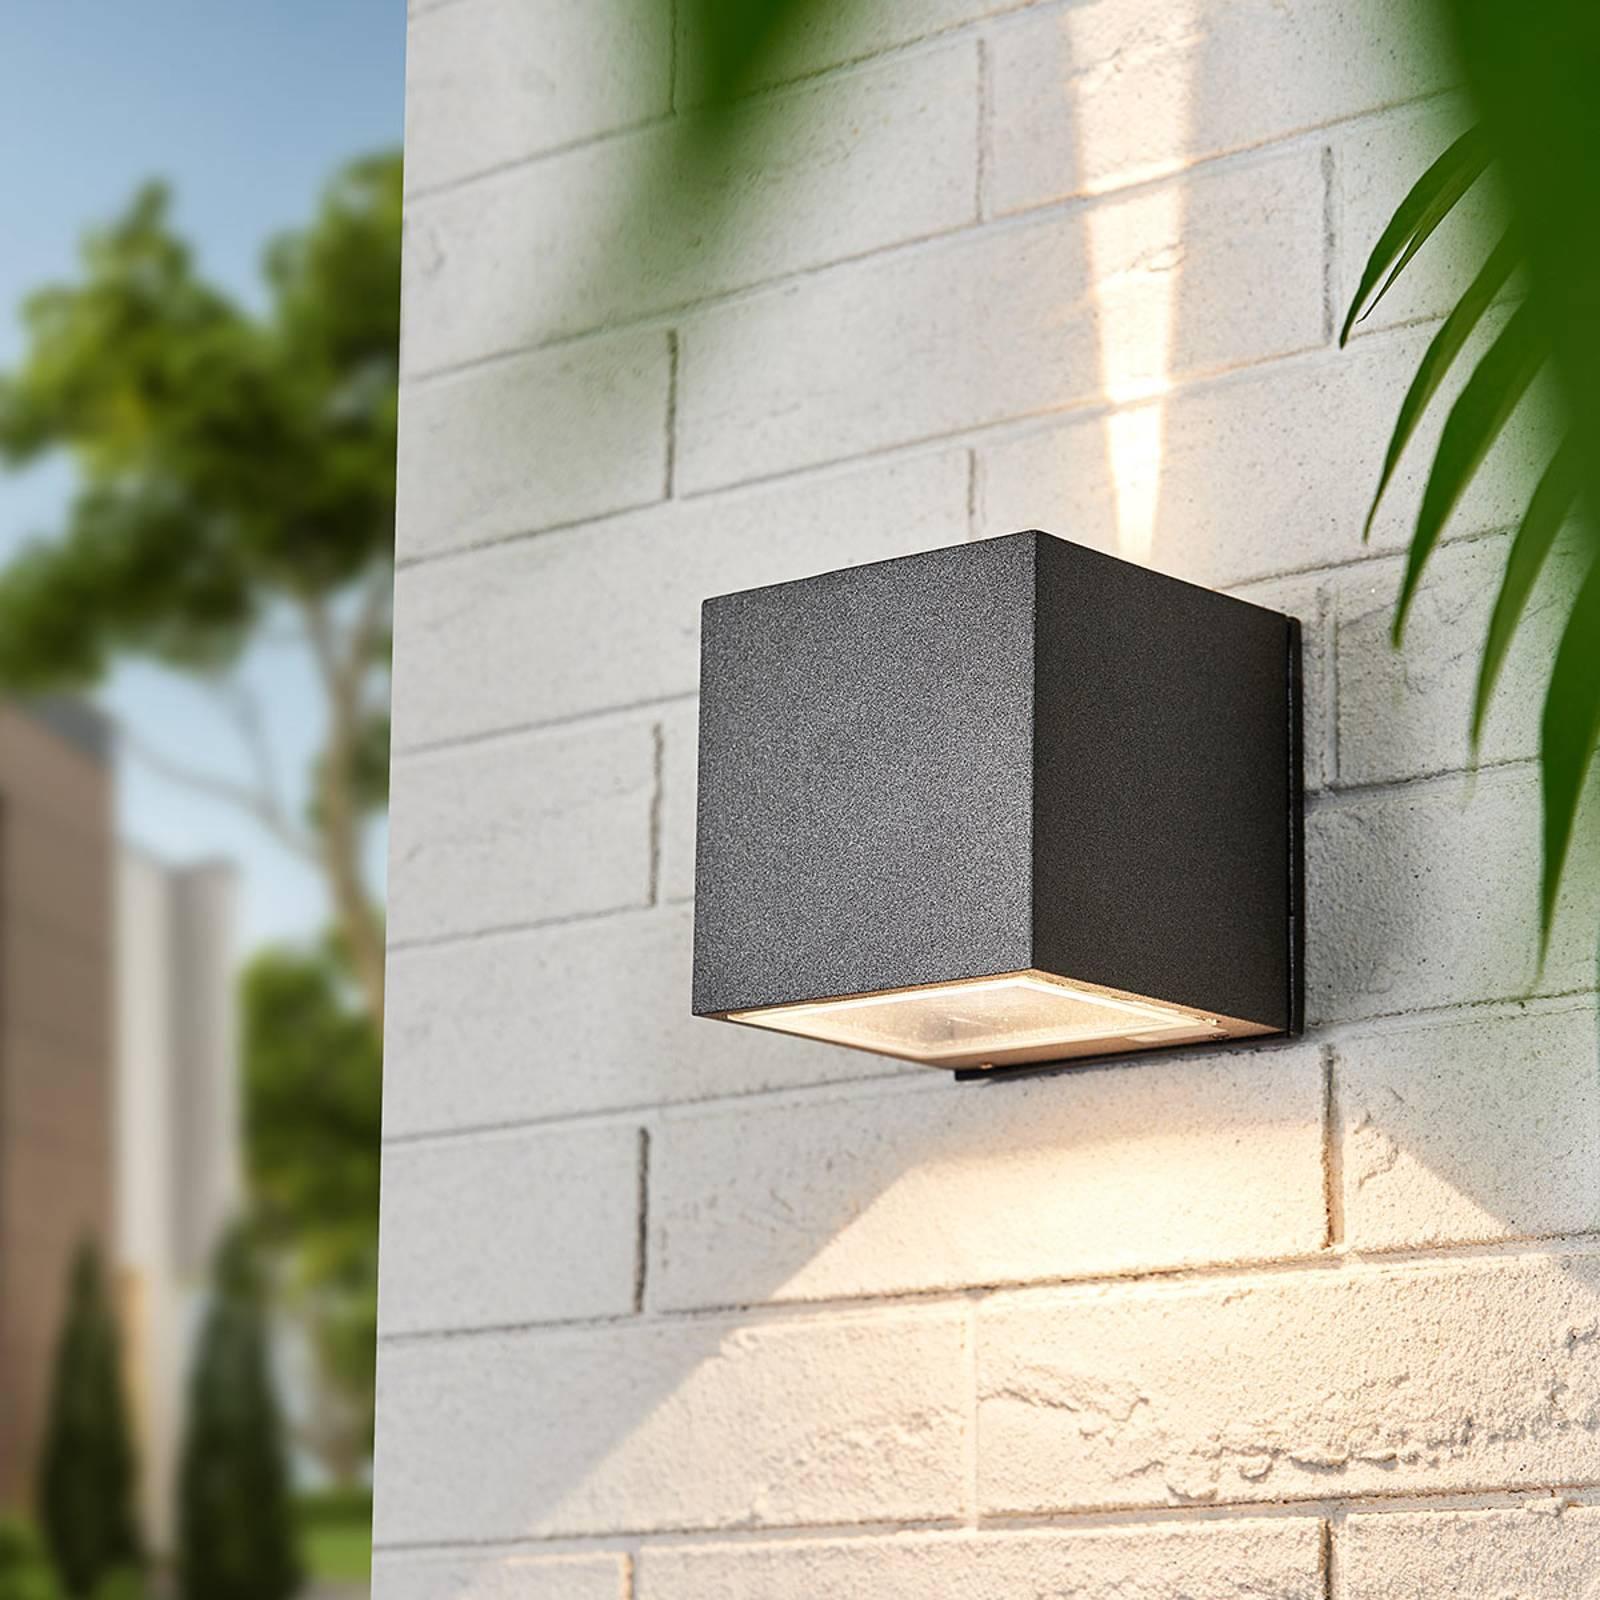 Kulmikas Leron-LED-spotti valaisu kapea-leveä